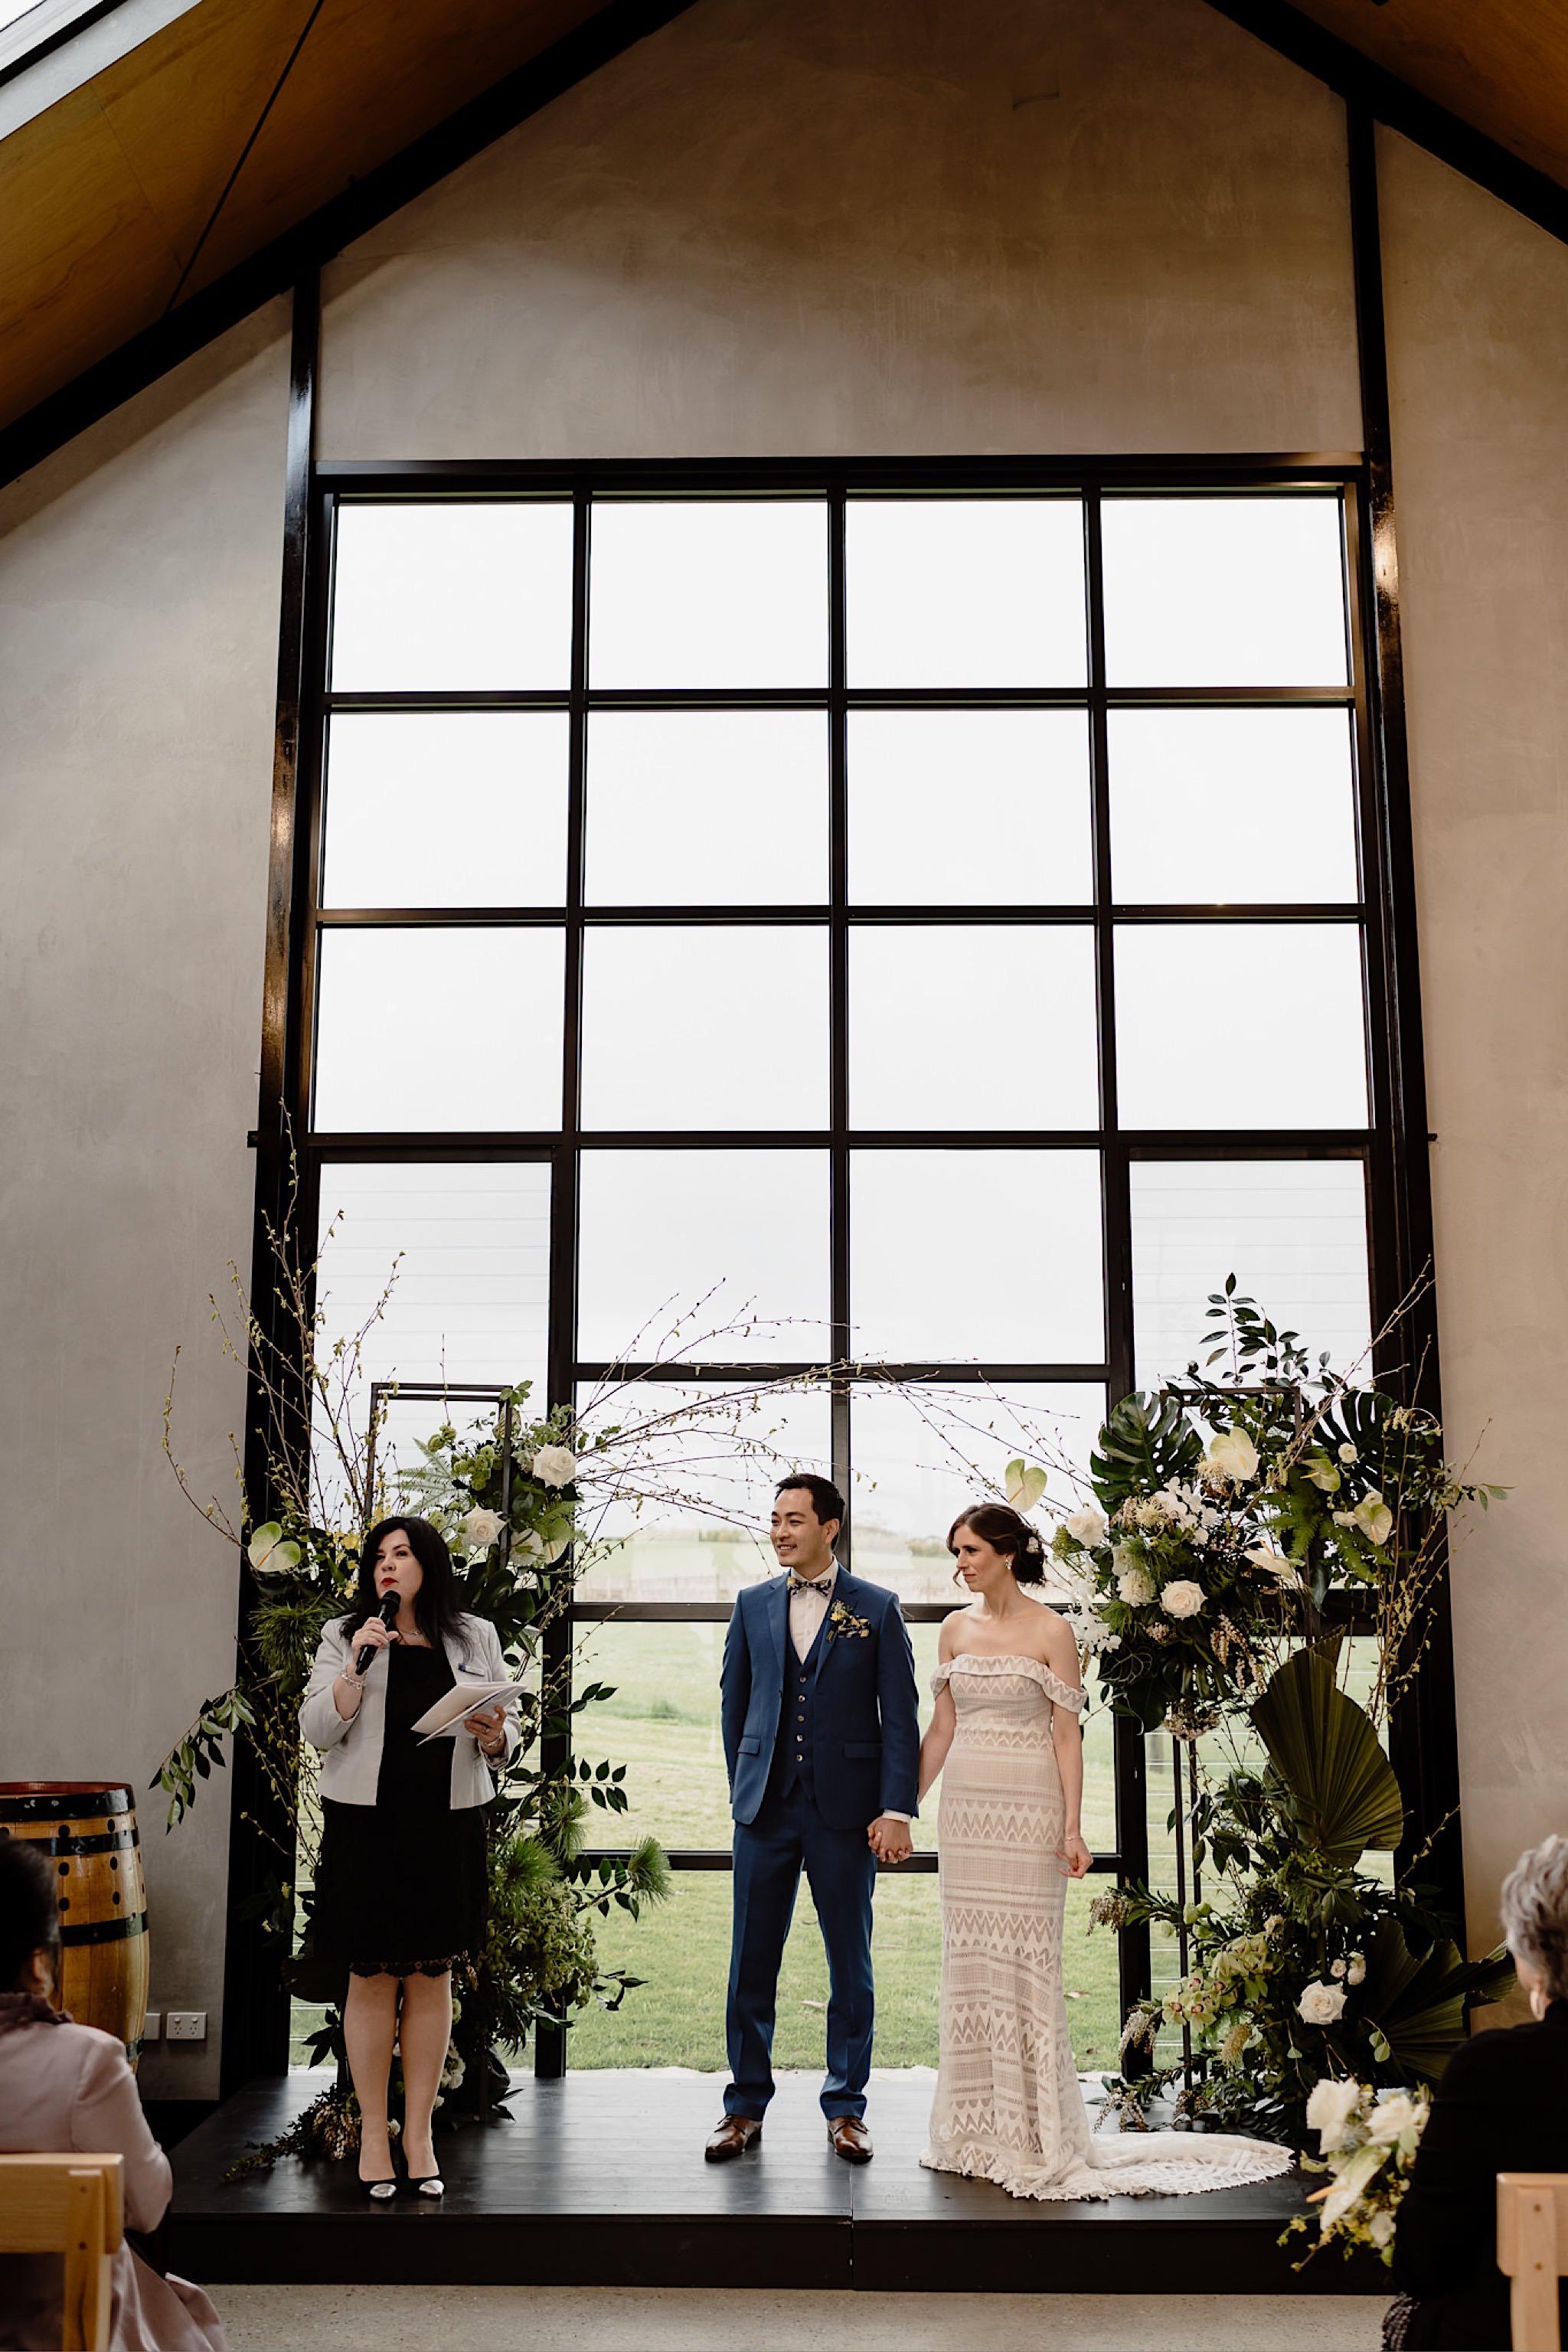 Zonzo Estate Winery Yarra Valley Wedding23.jpg